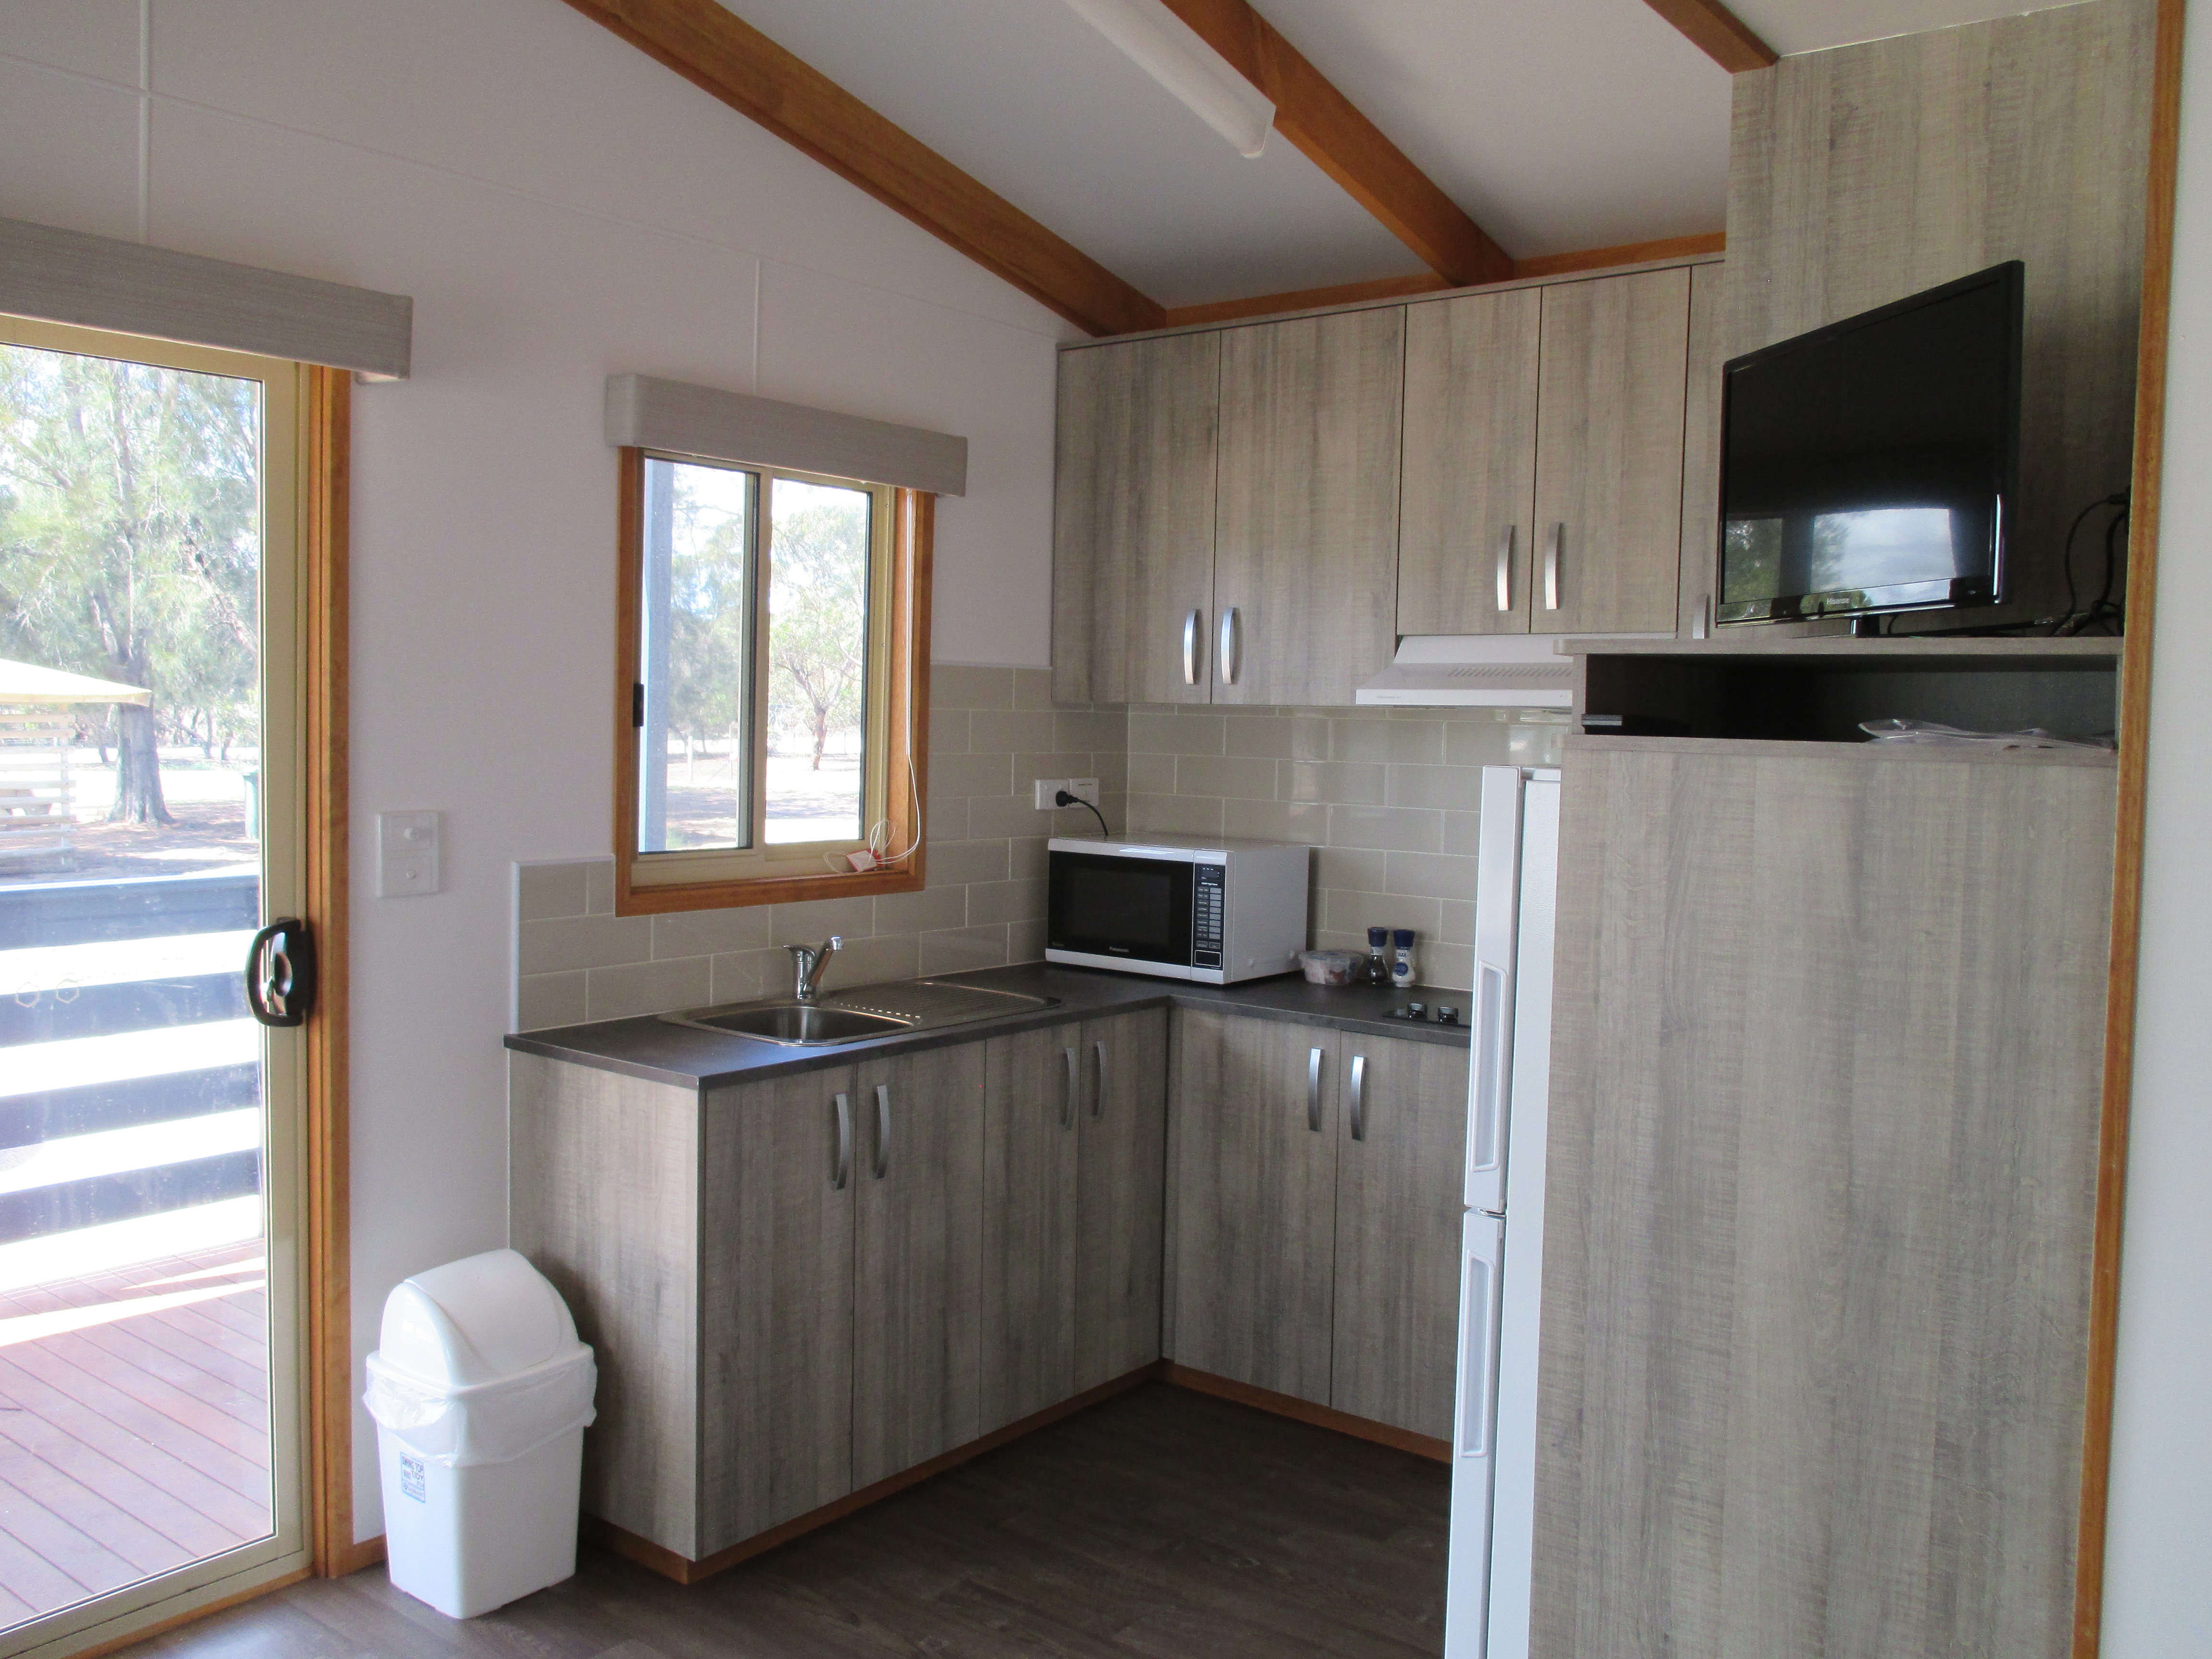 Karoonda ccommodation Modern Kitchen & ppliances - ^